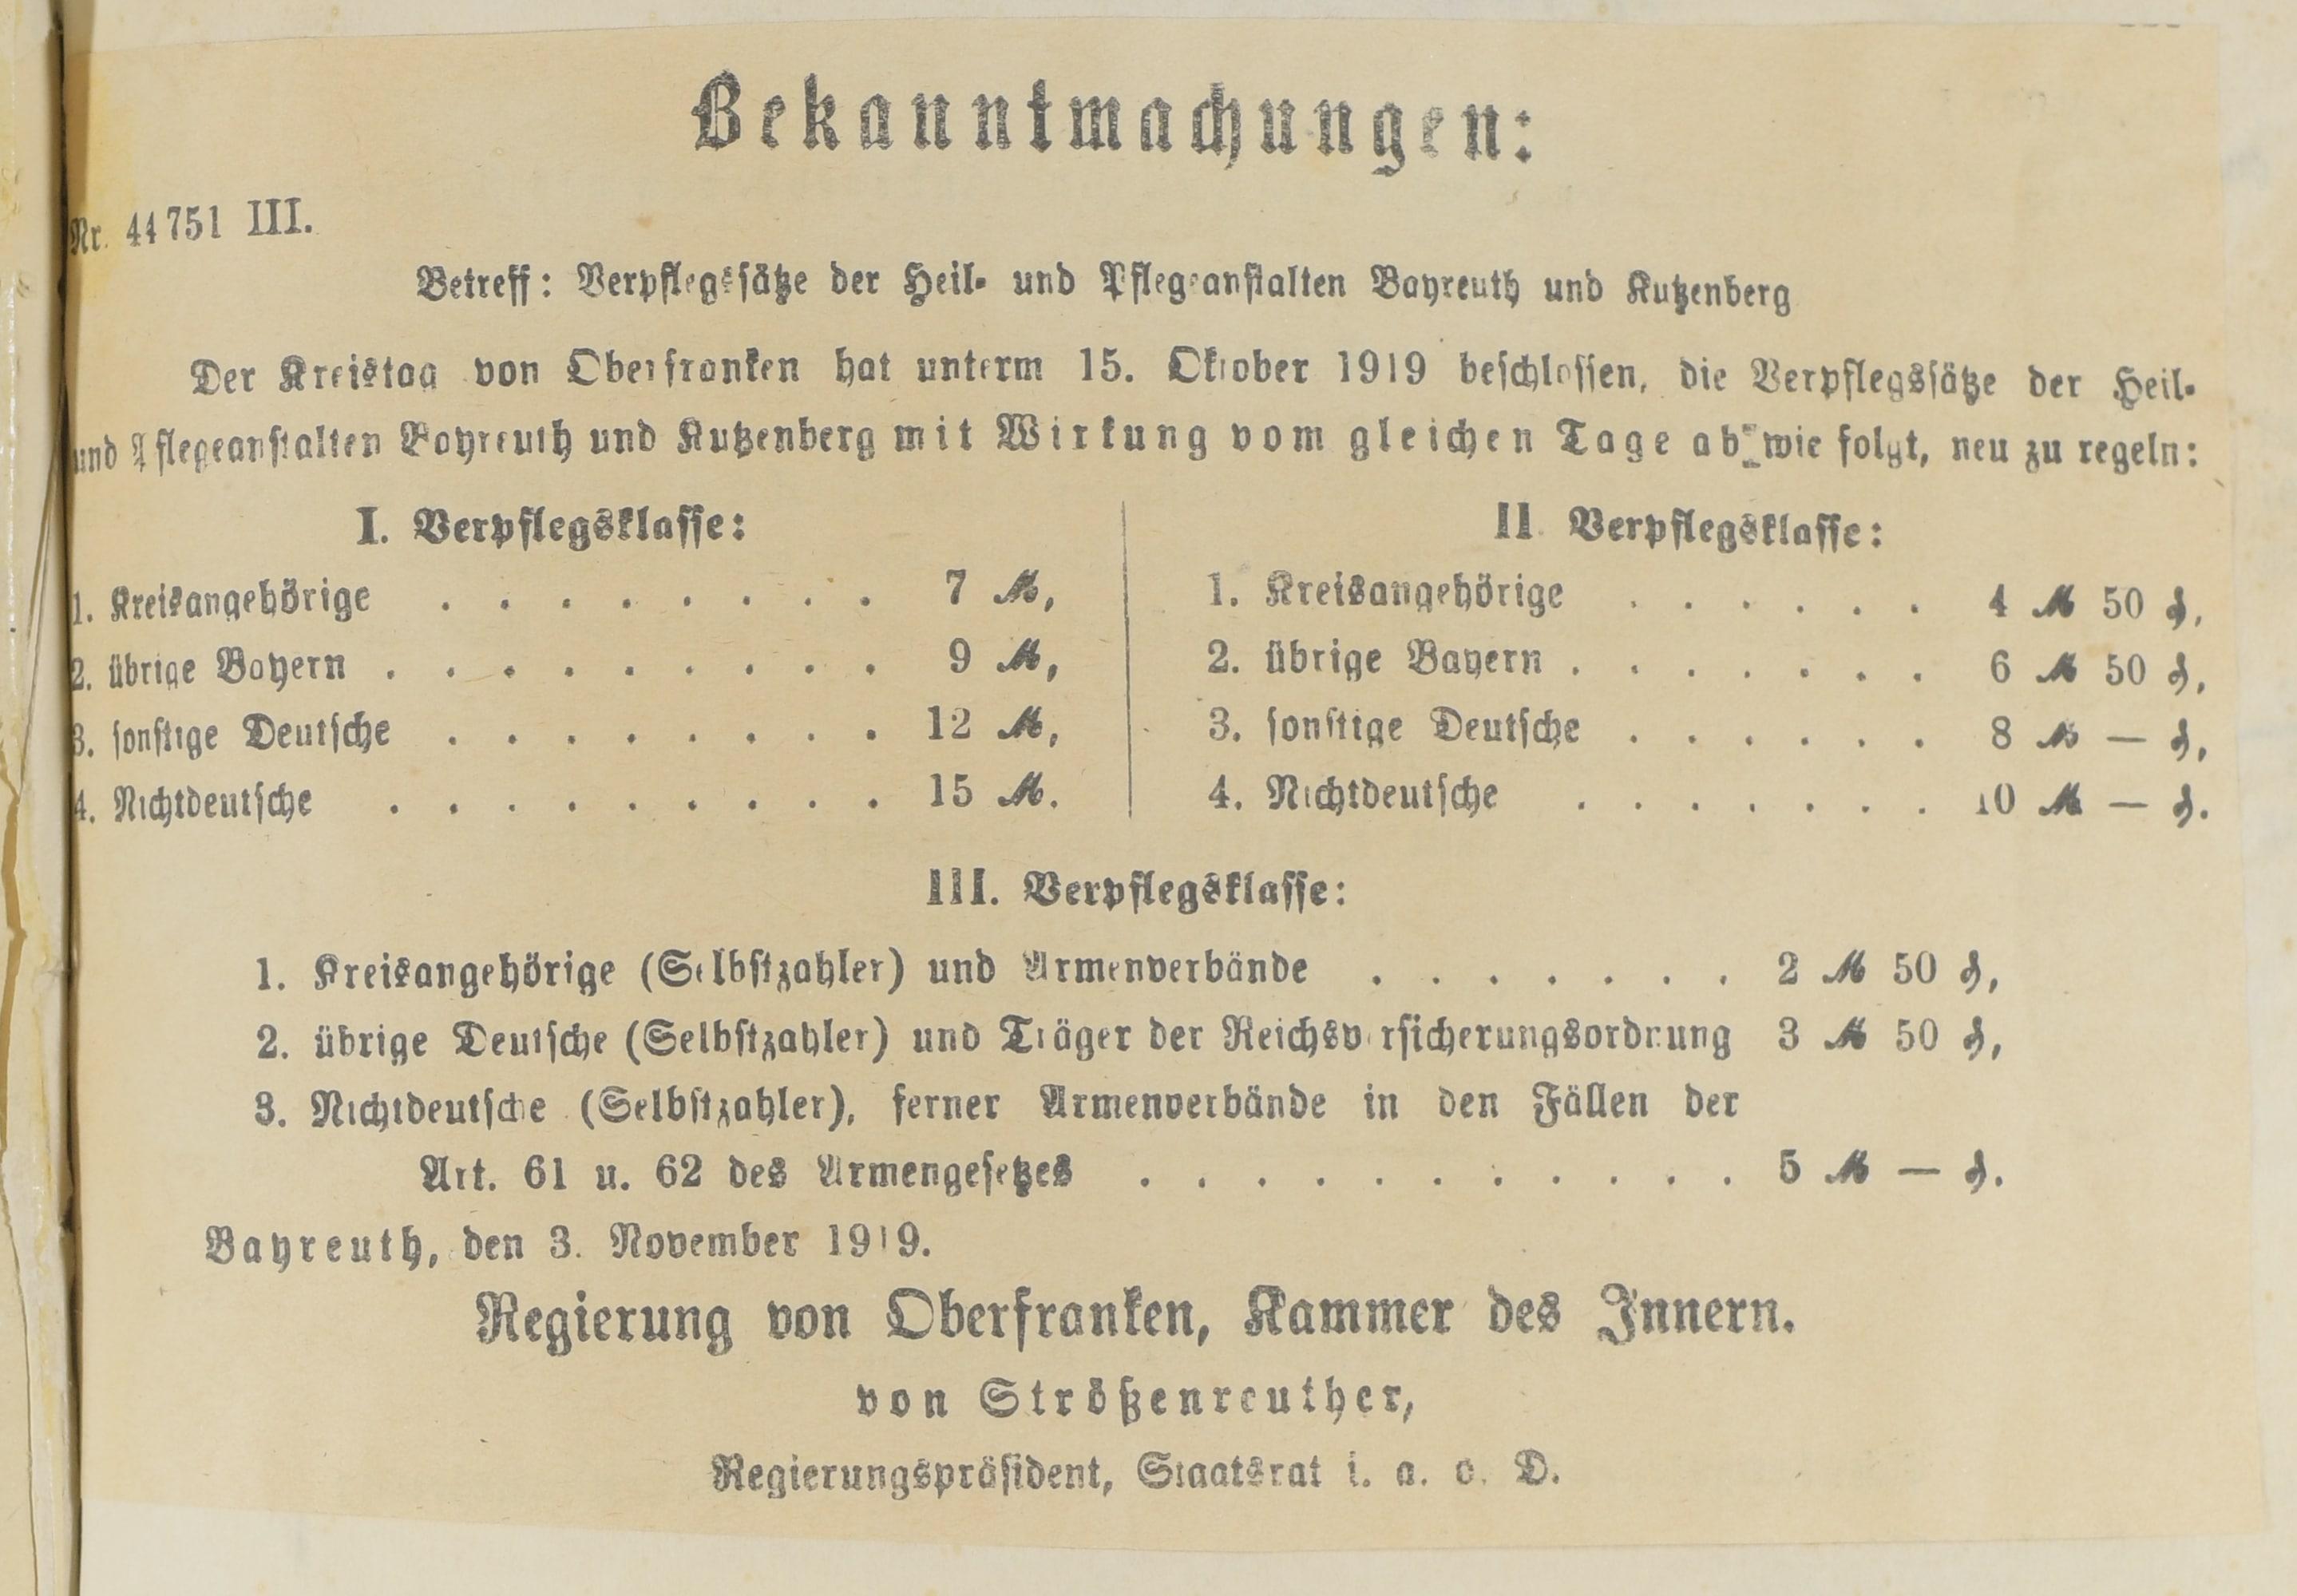 StadtABT, Akte Nr. 4826 Verpflegungssätze 1919